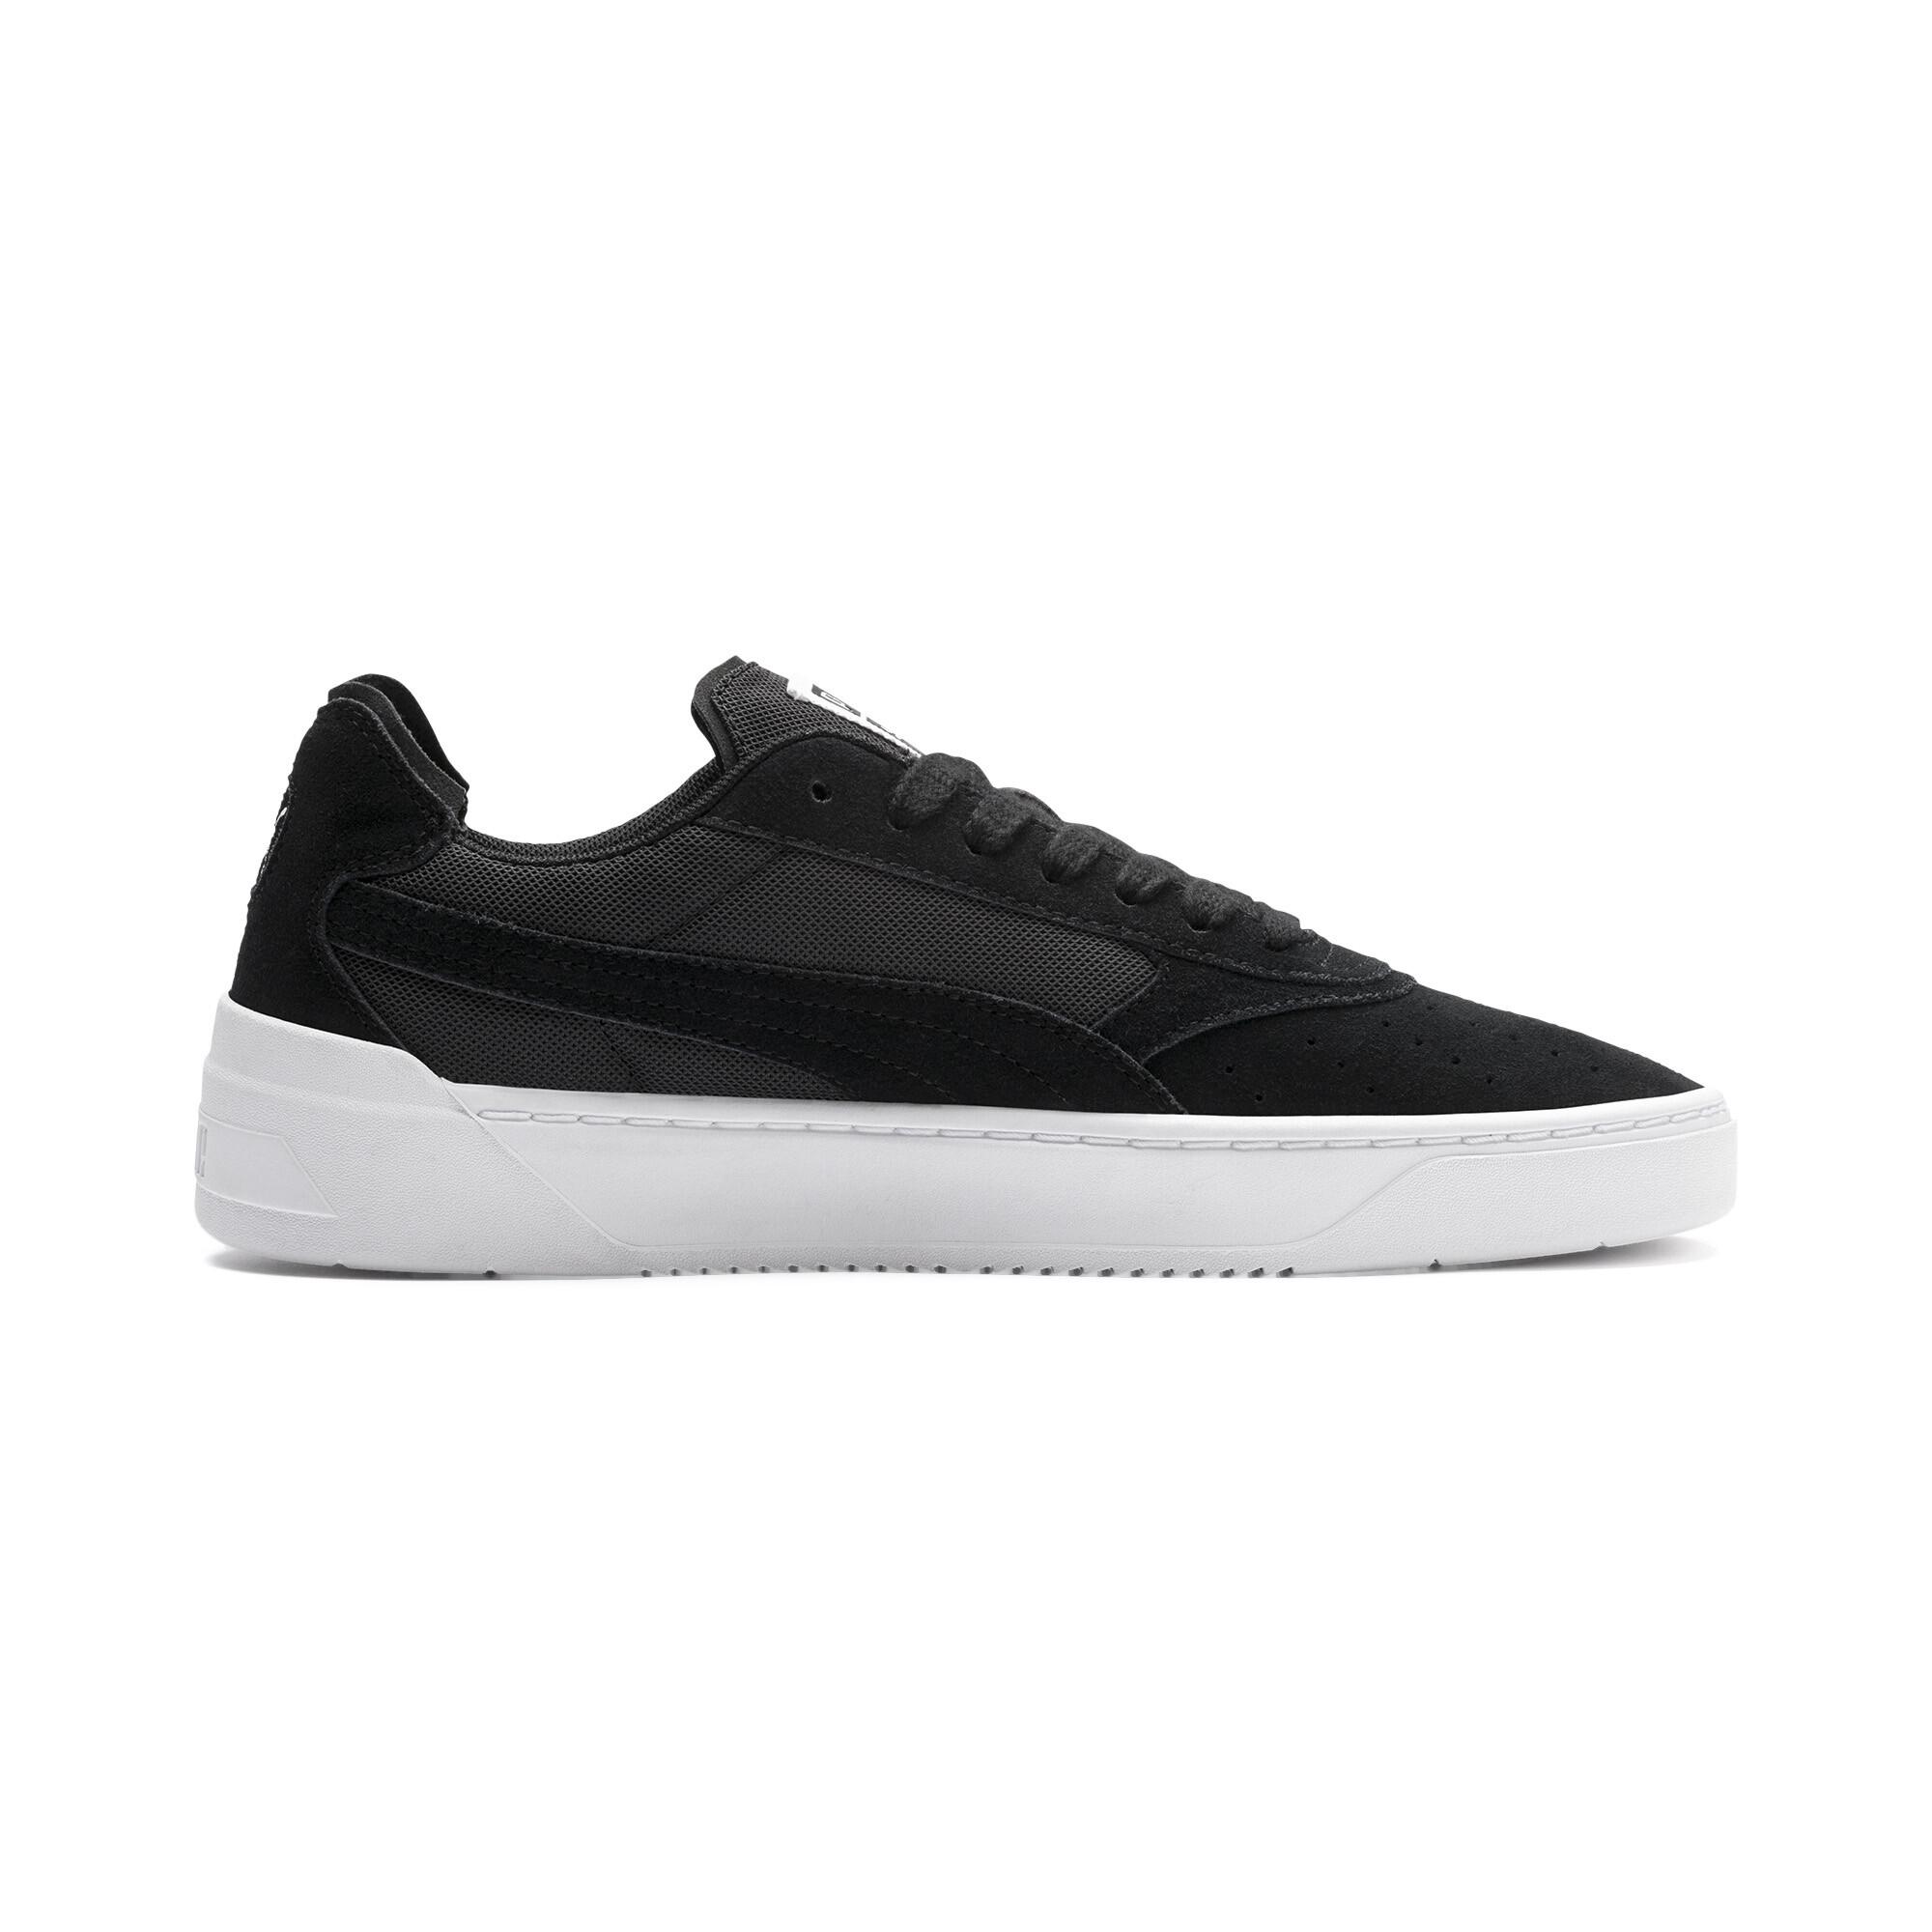 Image Puma Cali-0 Summer Sneakers #6